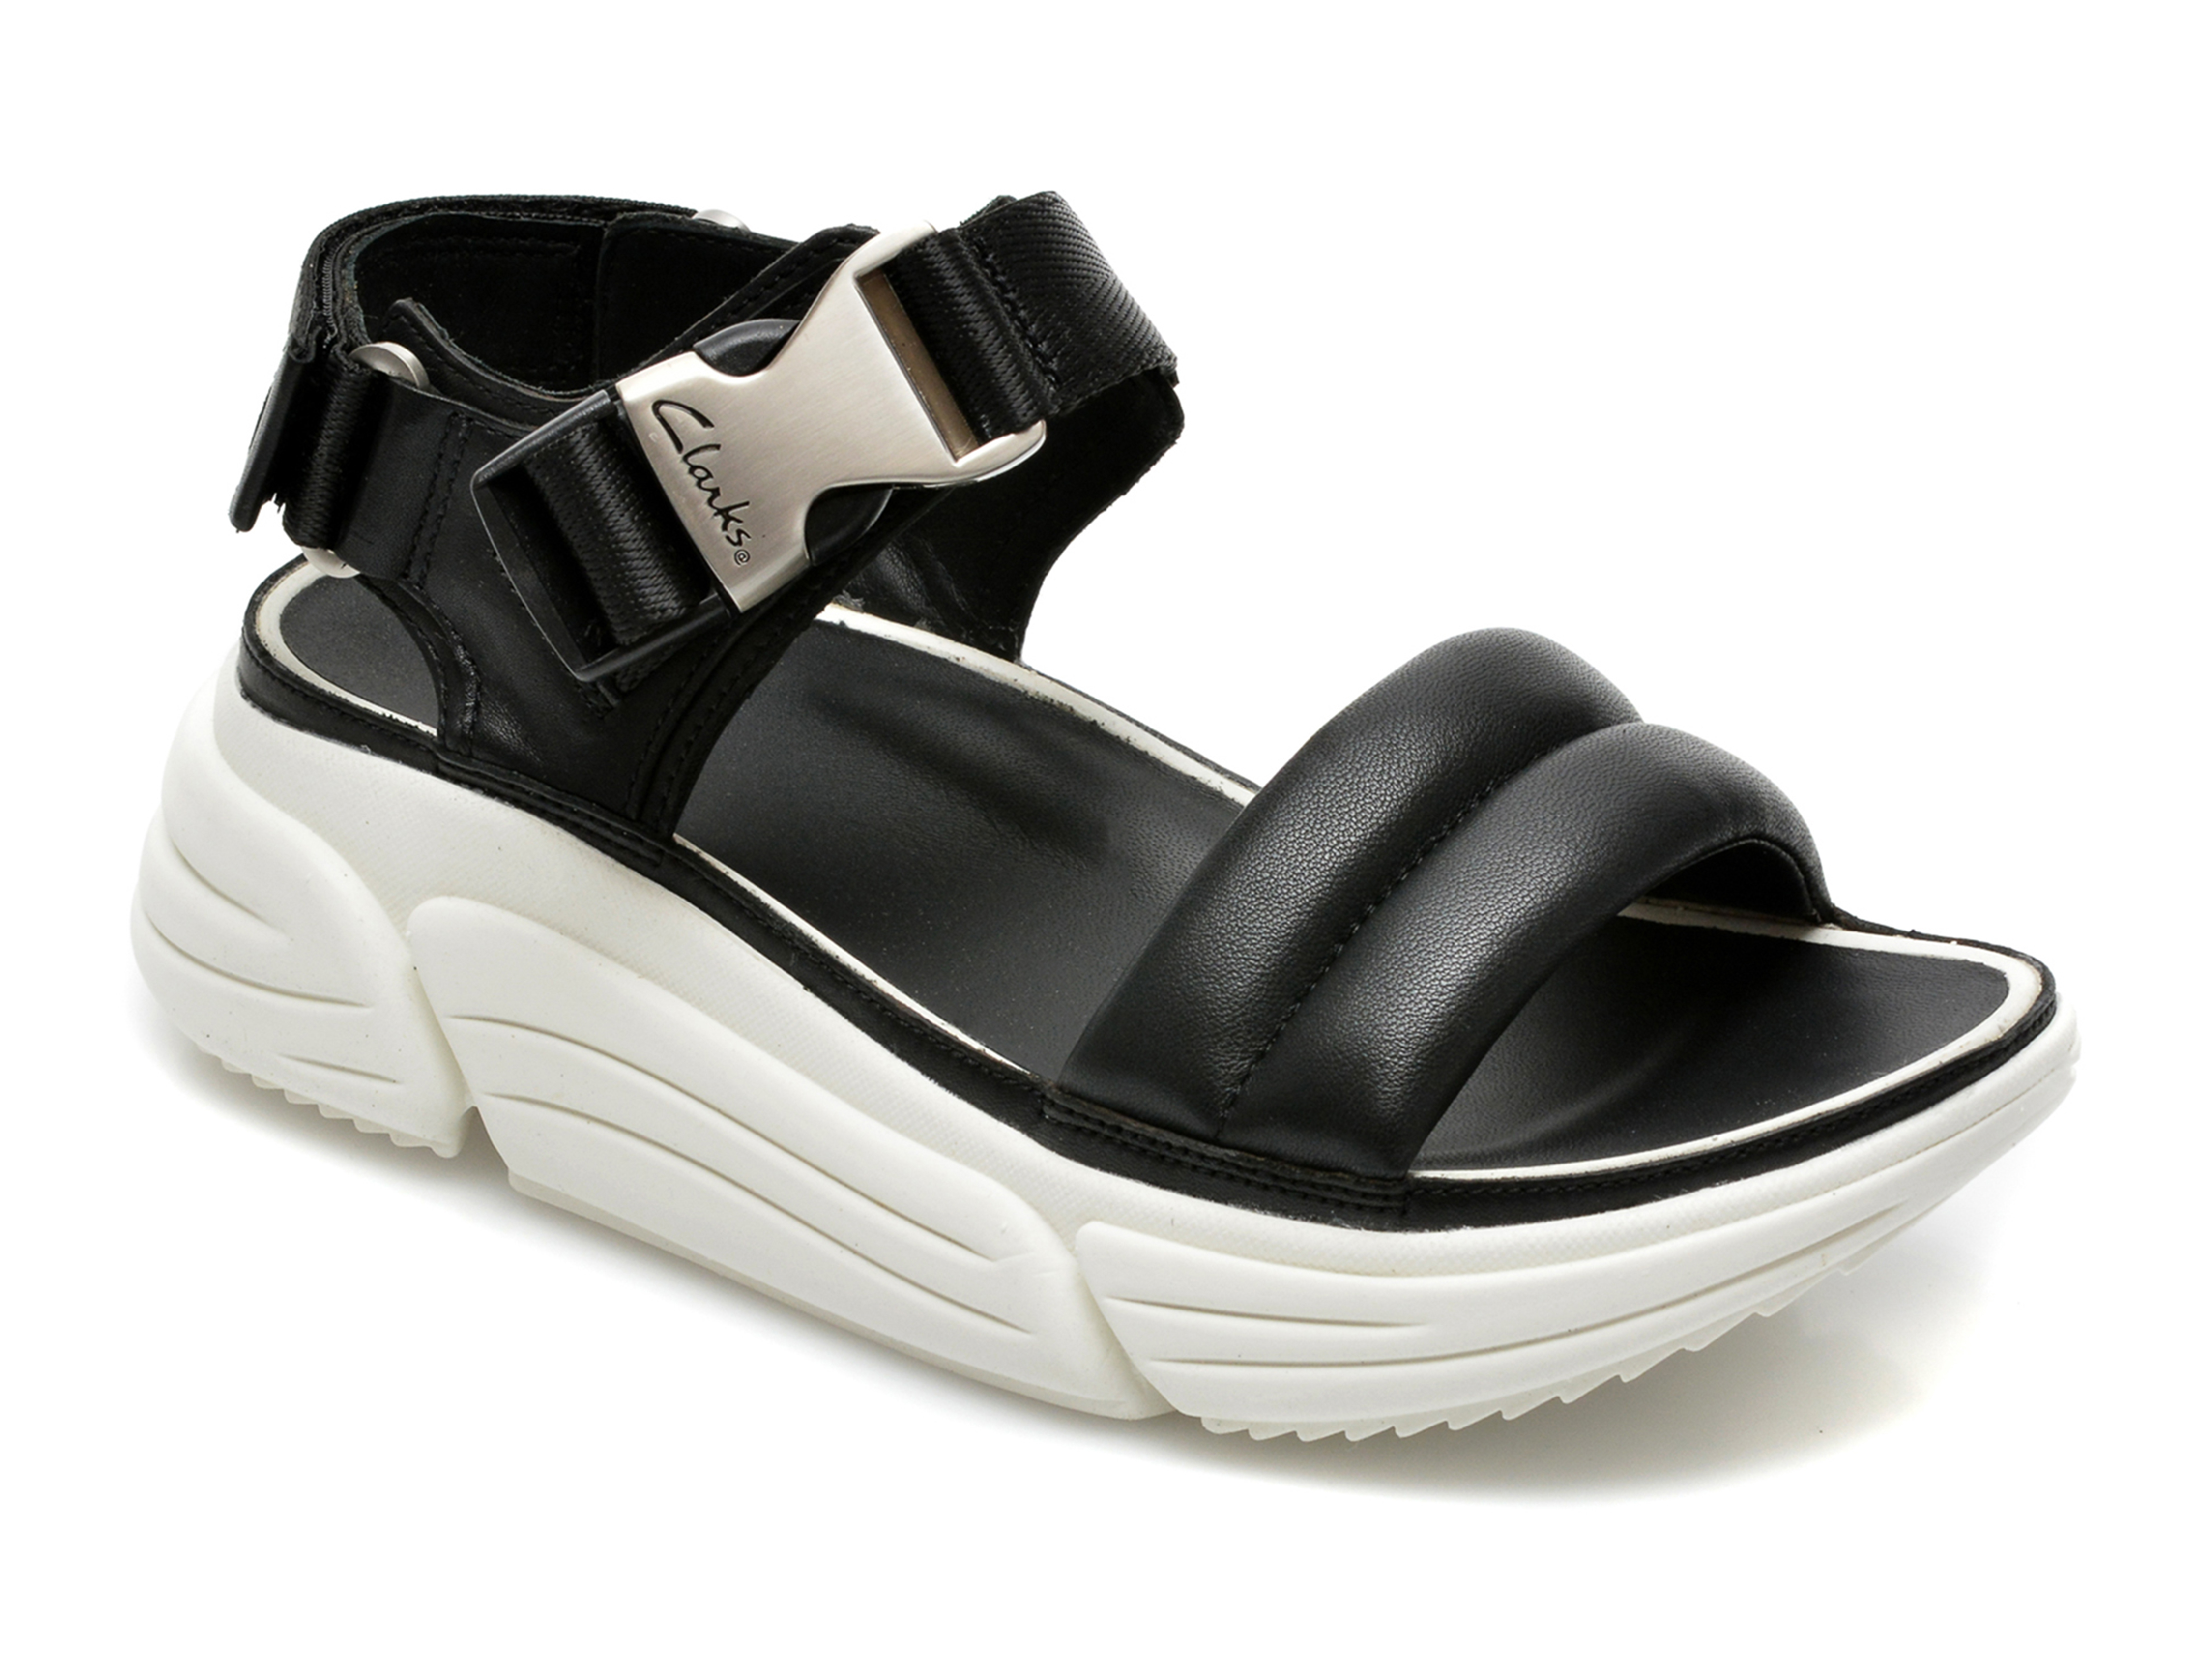 Sandale CLARKS negre, Tricomet Sun, din piele naturala imagine otter.ro 2021